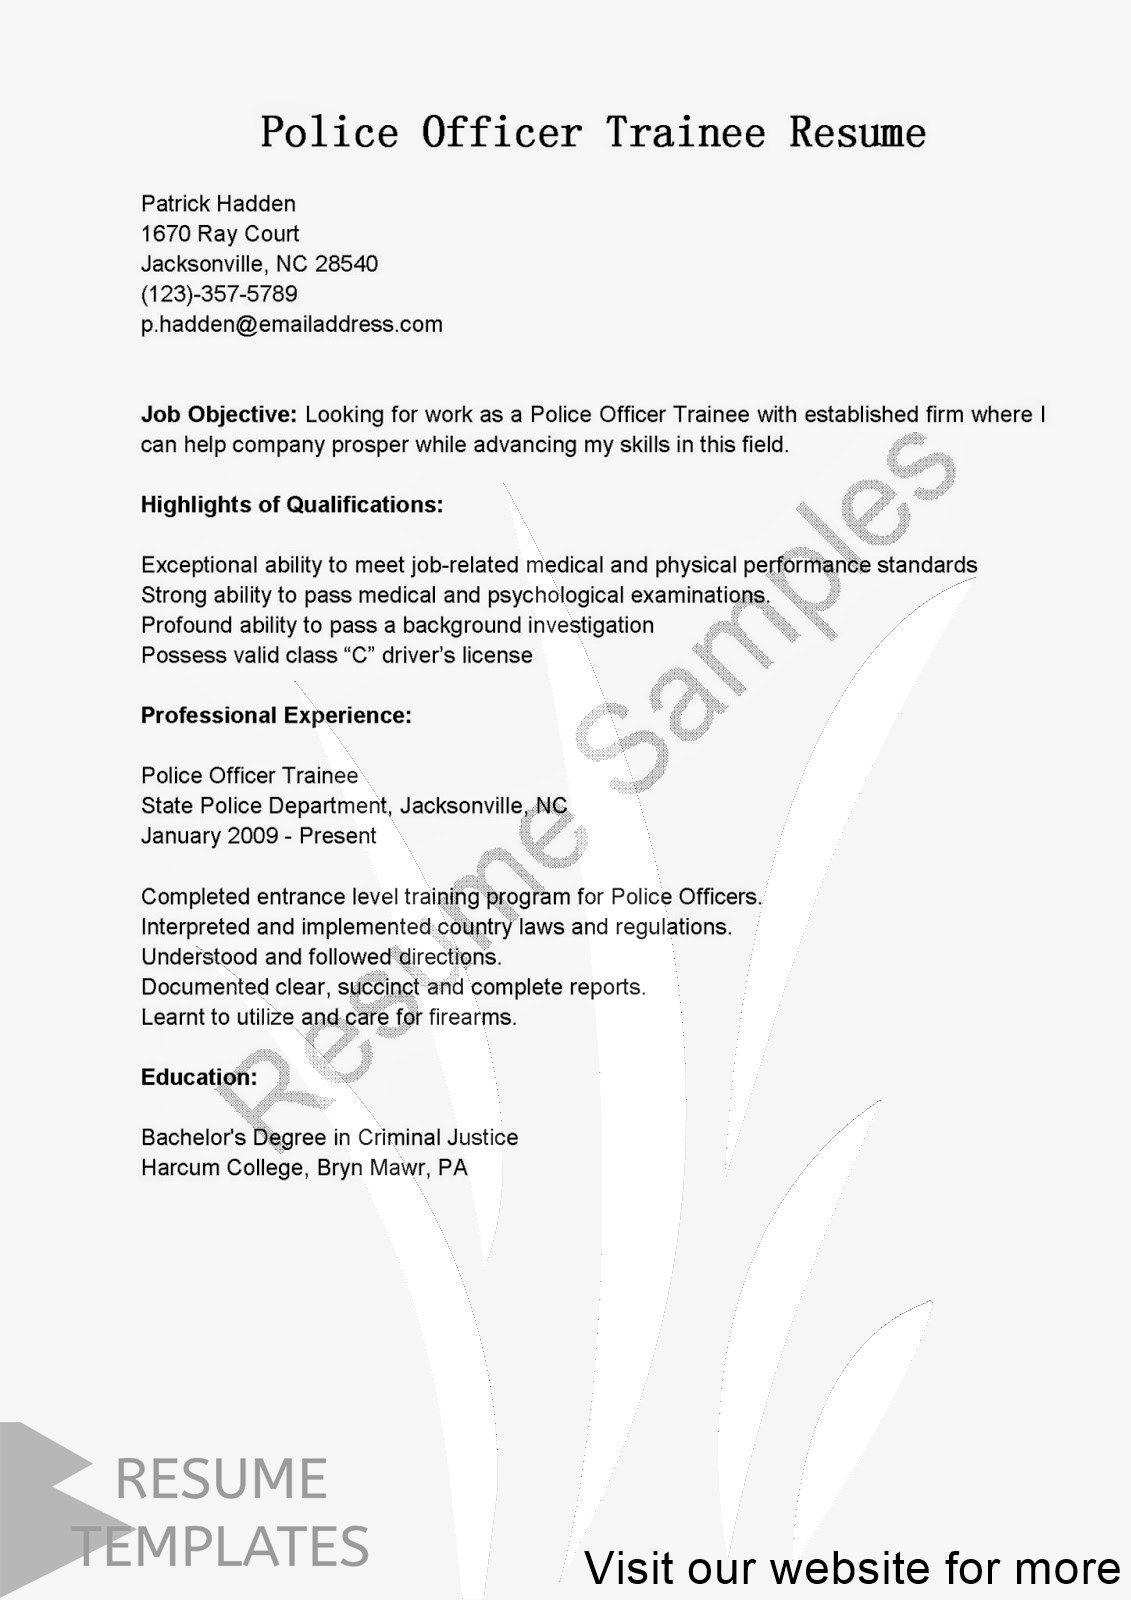 simple resume template australia in 2020 Resume template